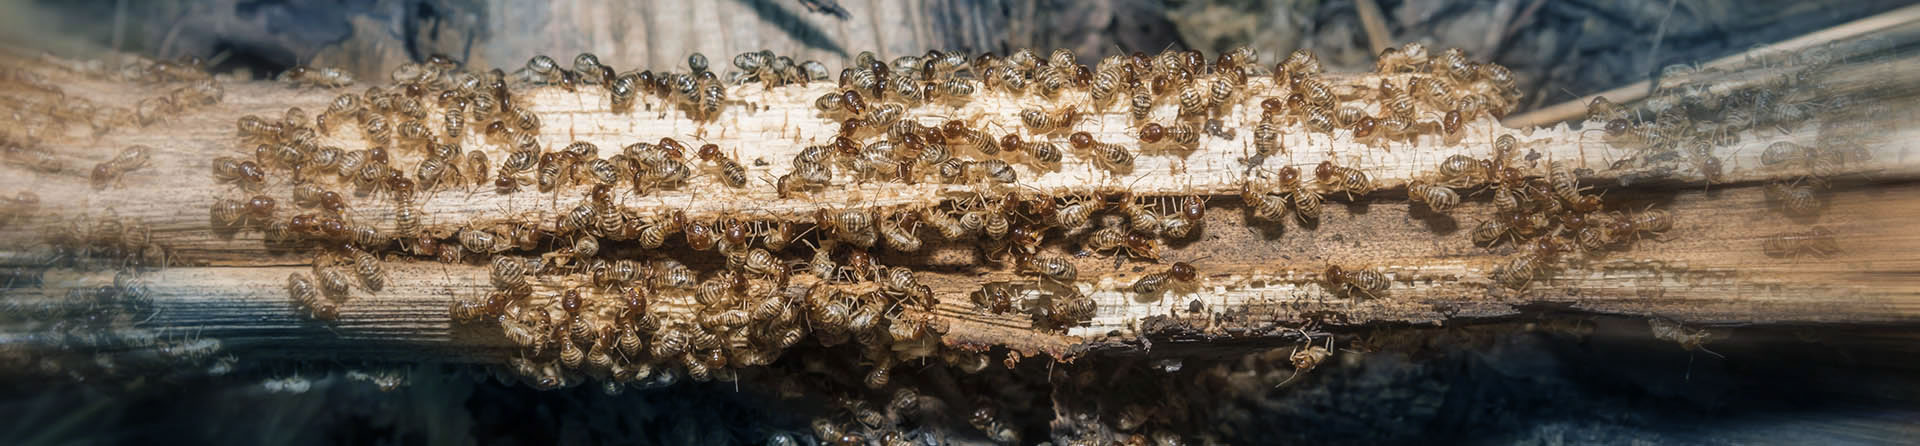 Termite Infestation Treatment Sacramento